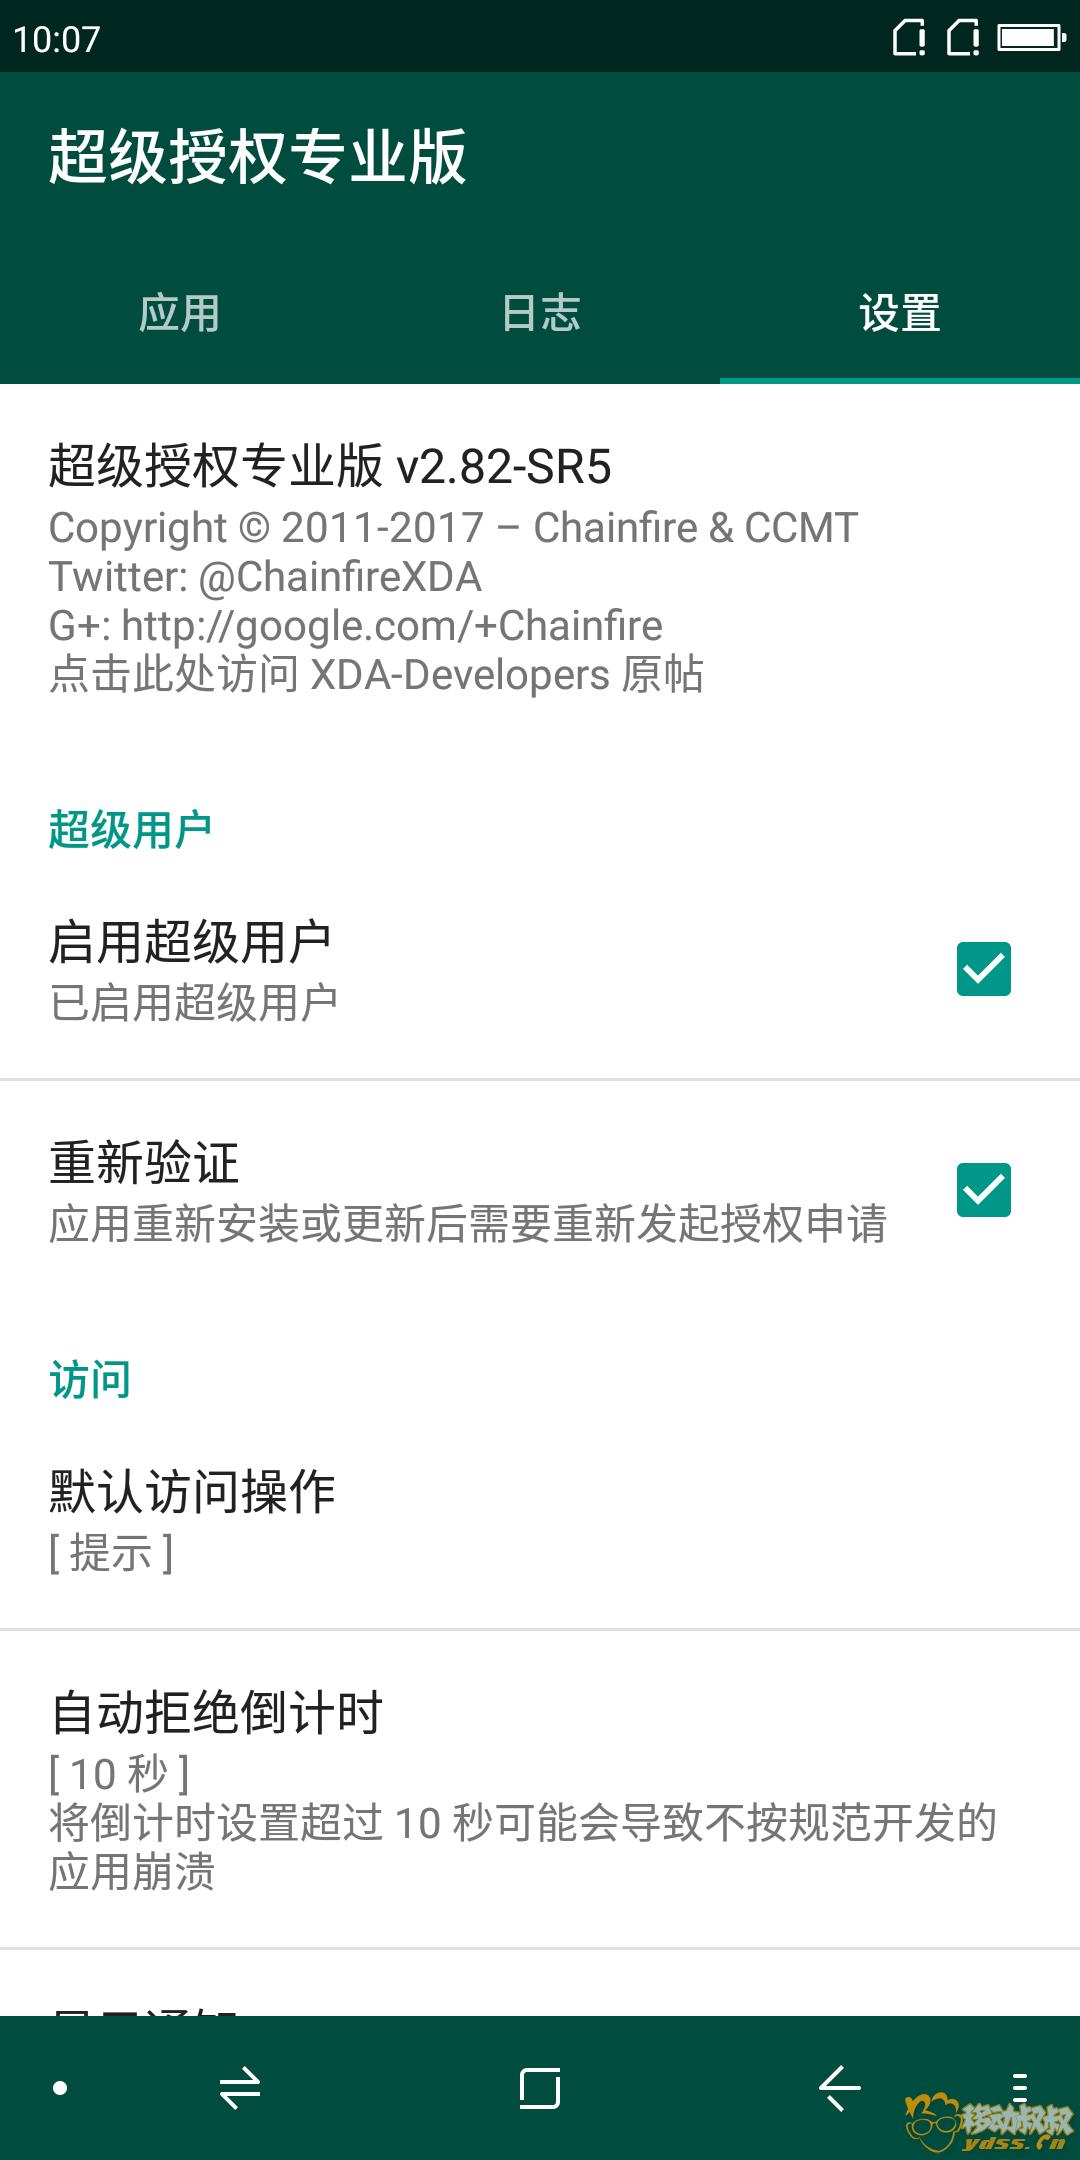 Screenshot_2018-07-12-10-07-42.png